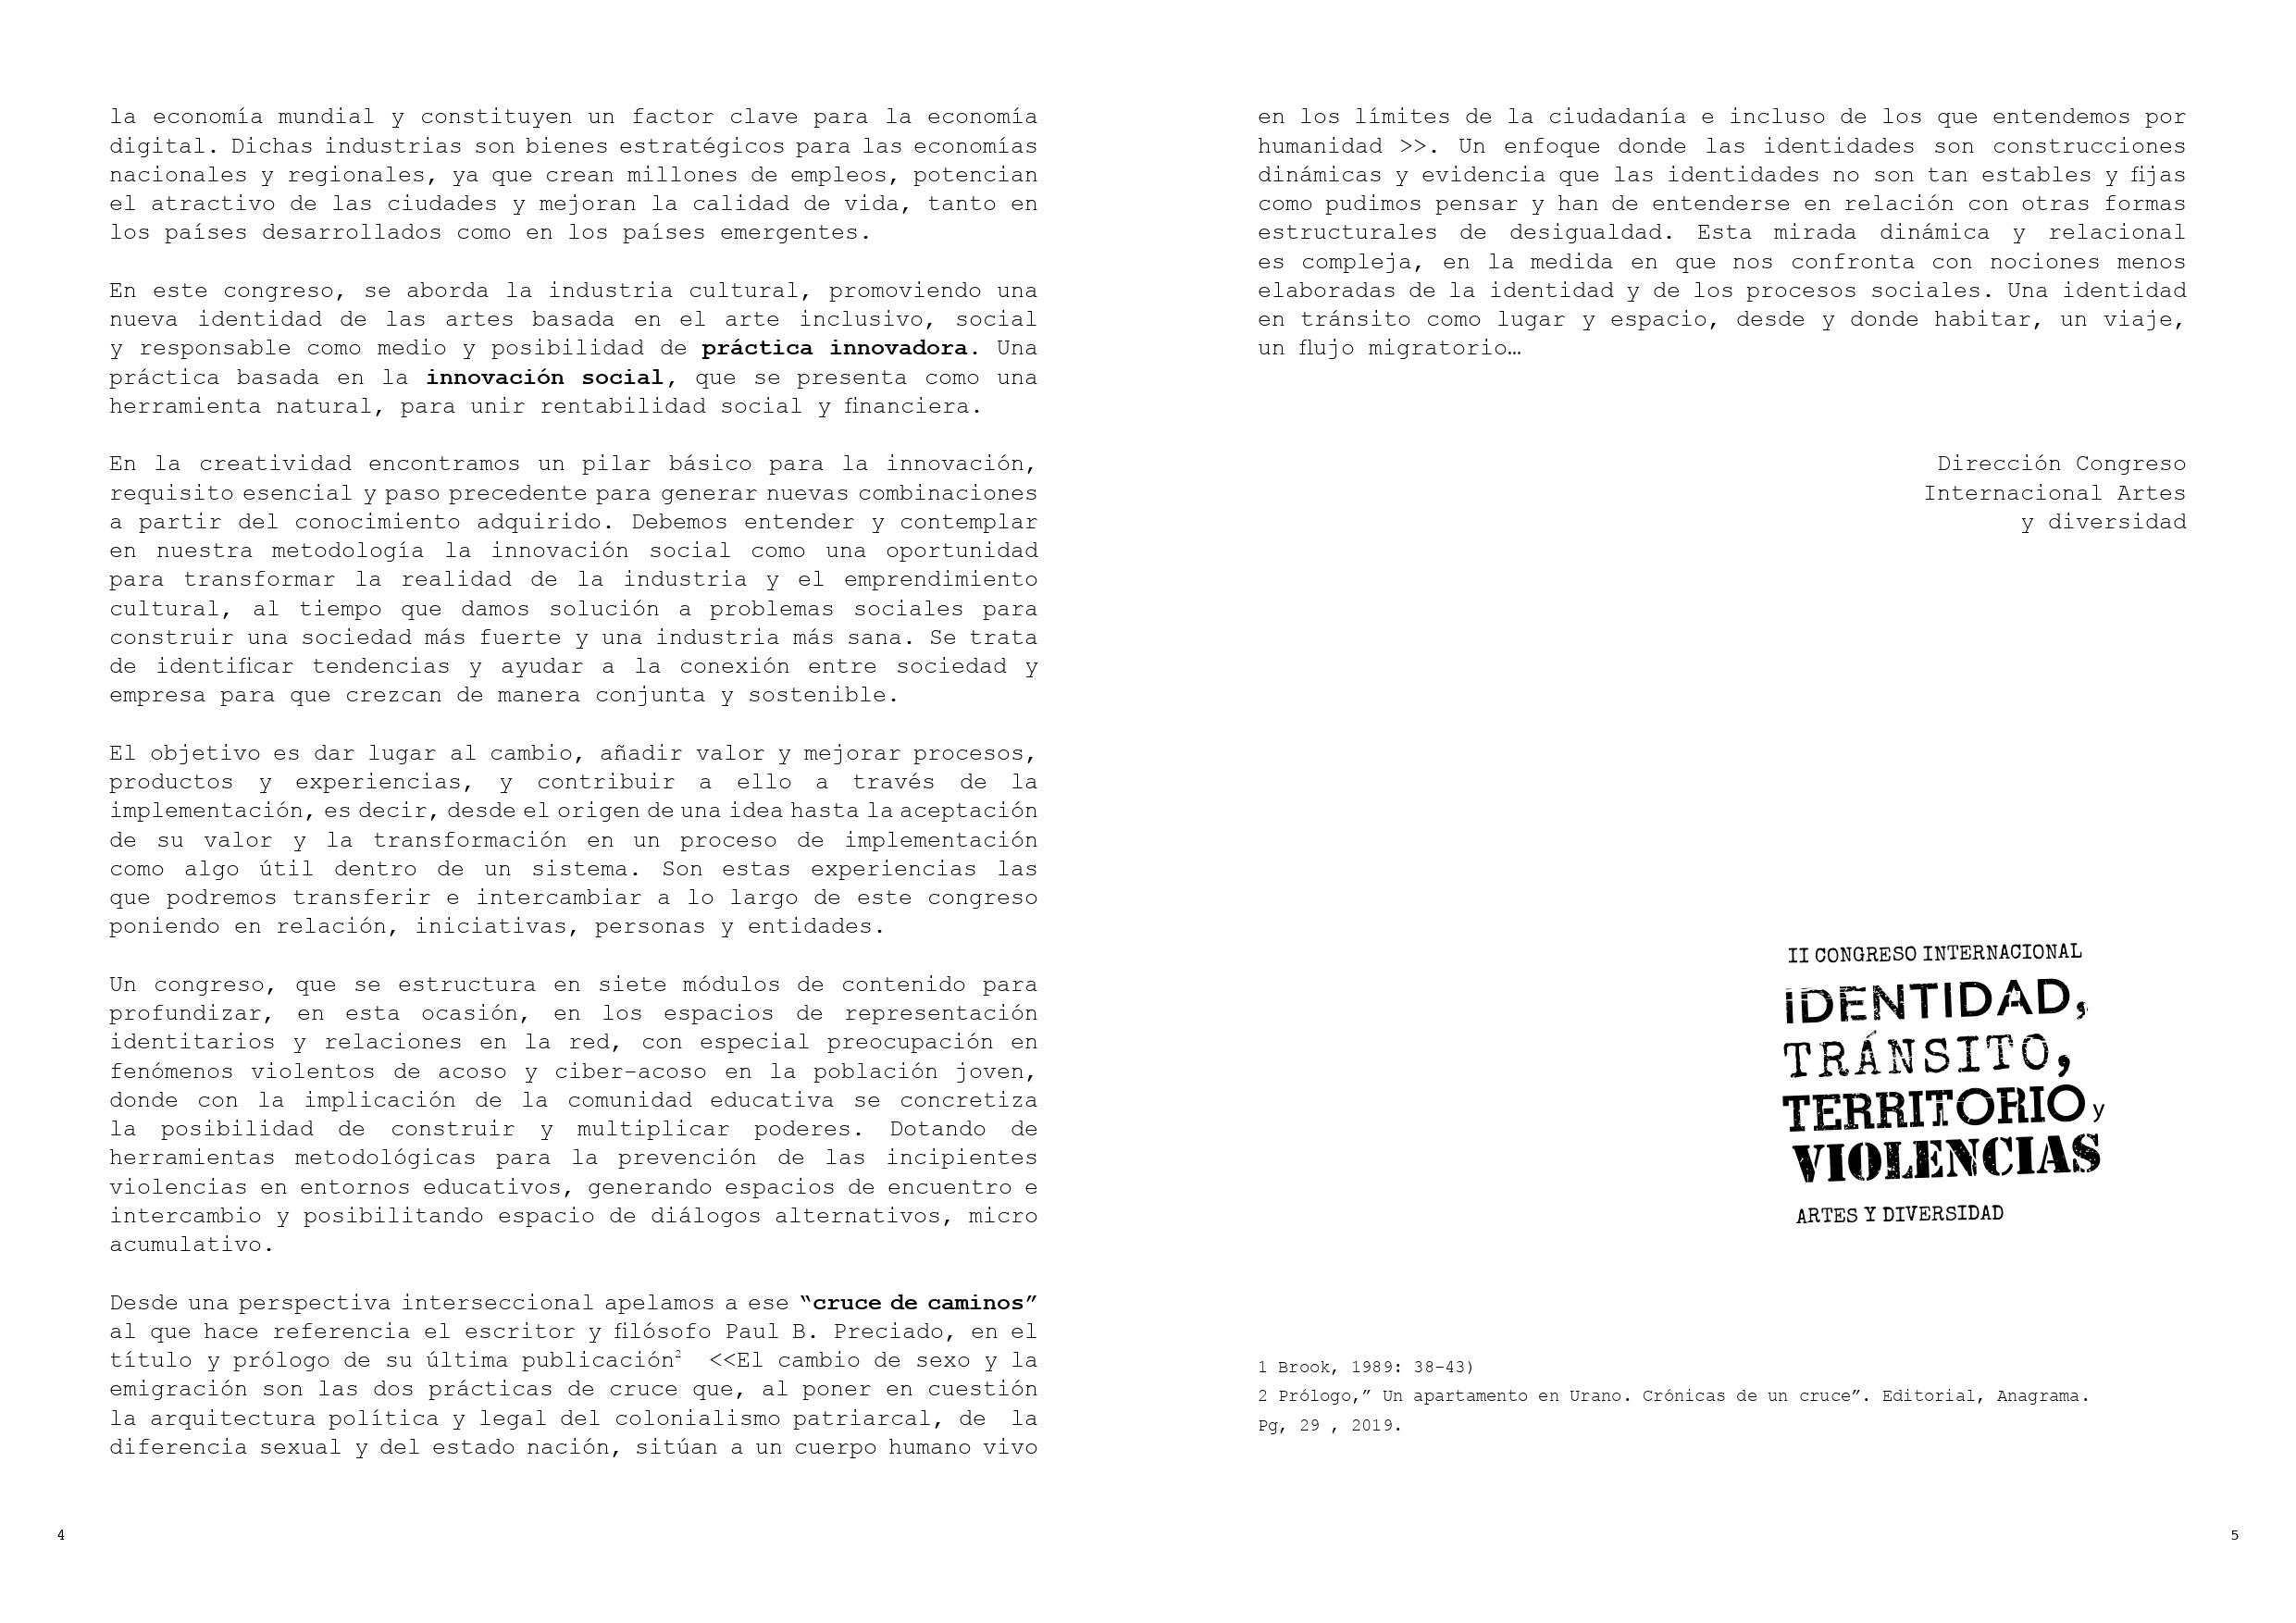 Programa-congreso-I_page-0003.jpg